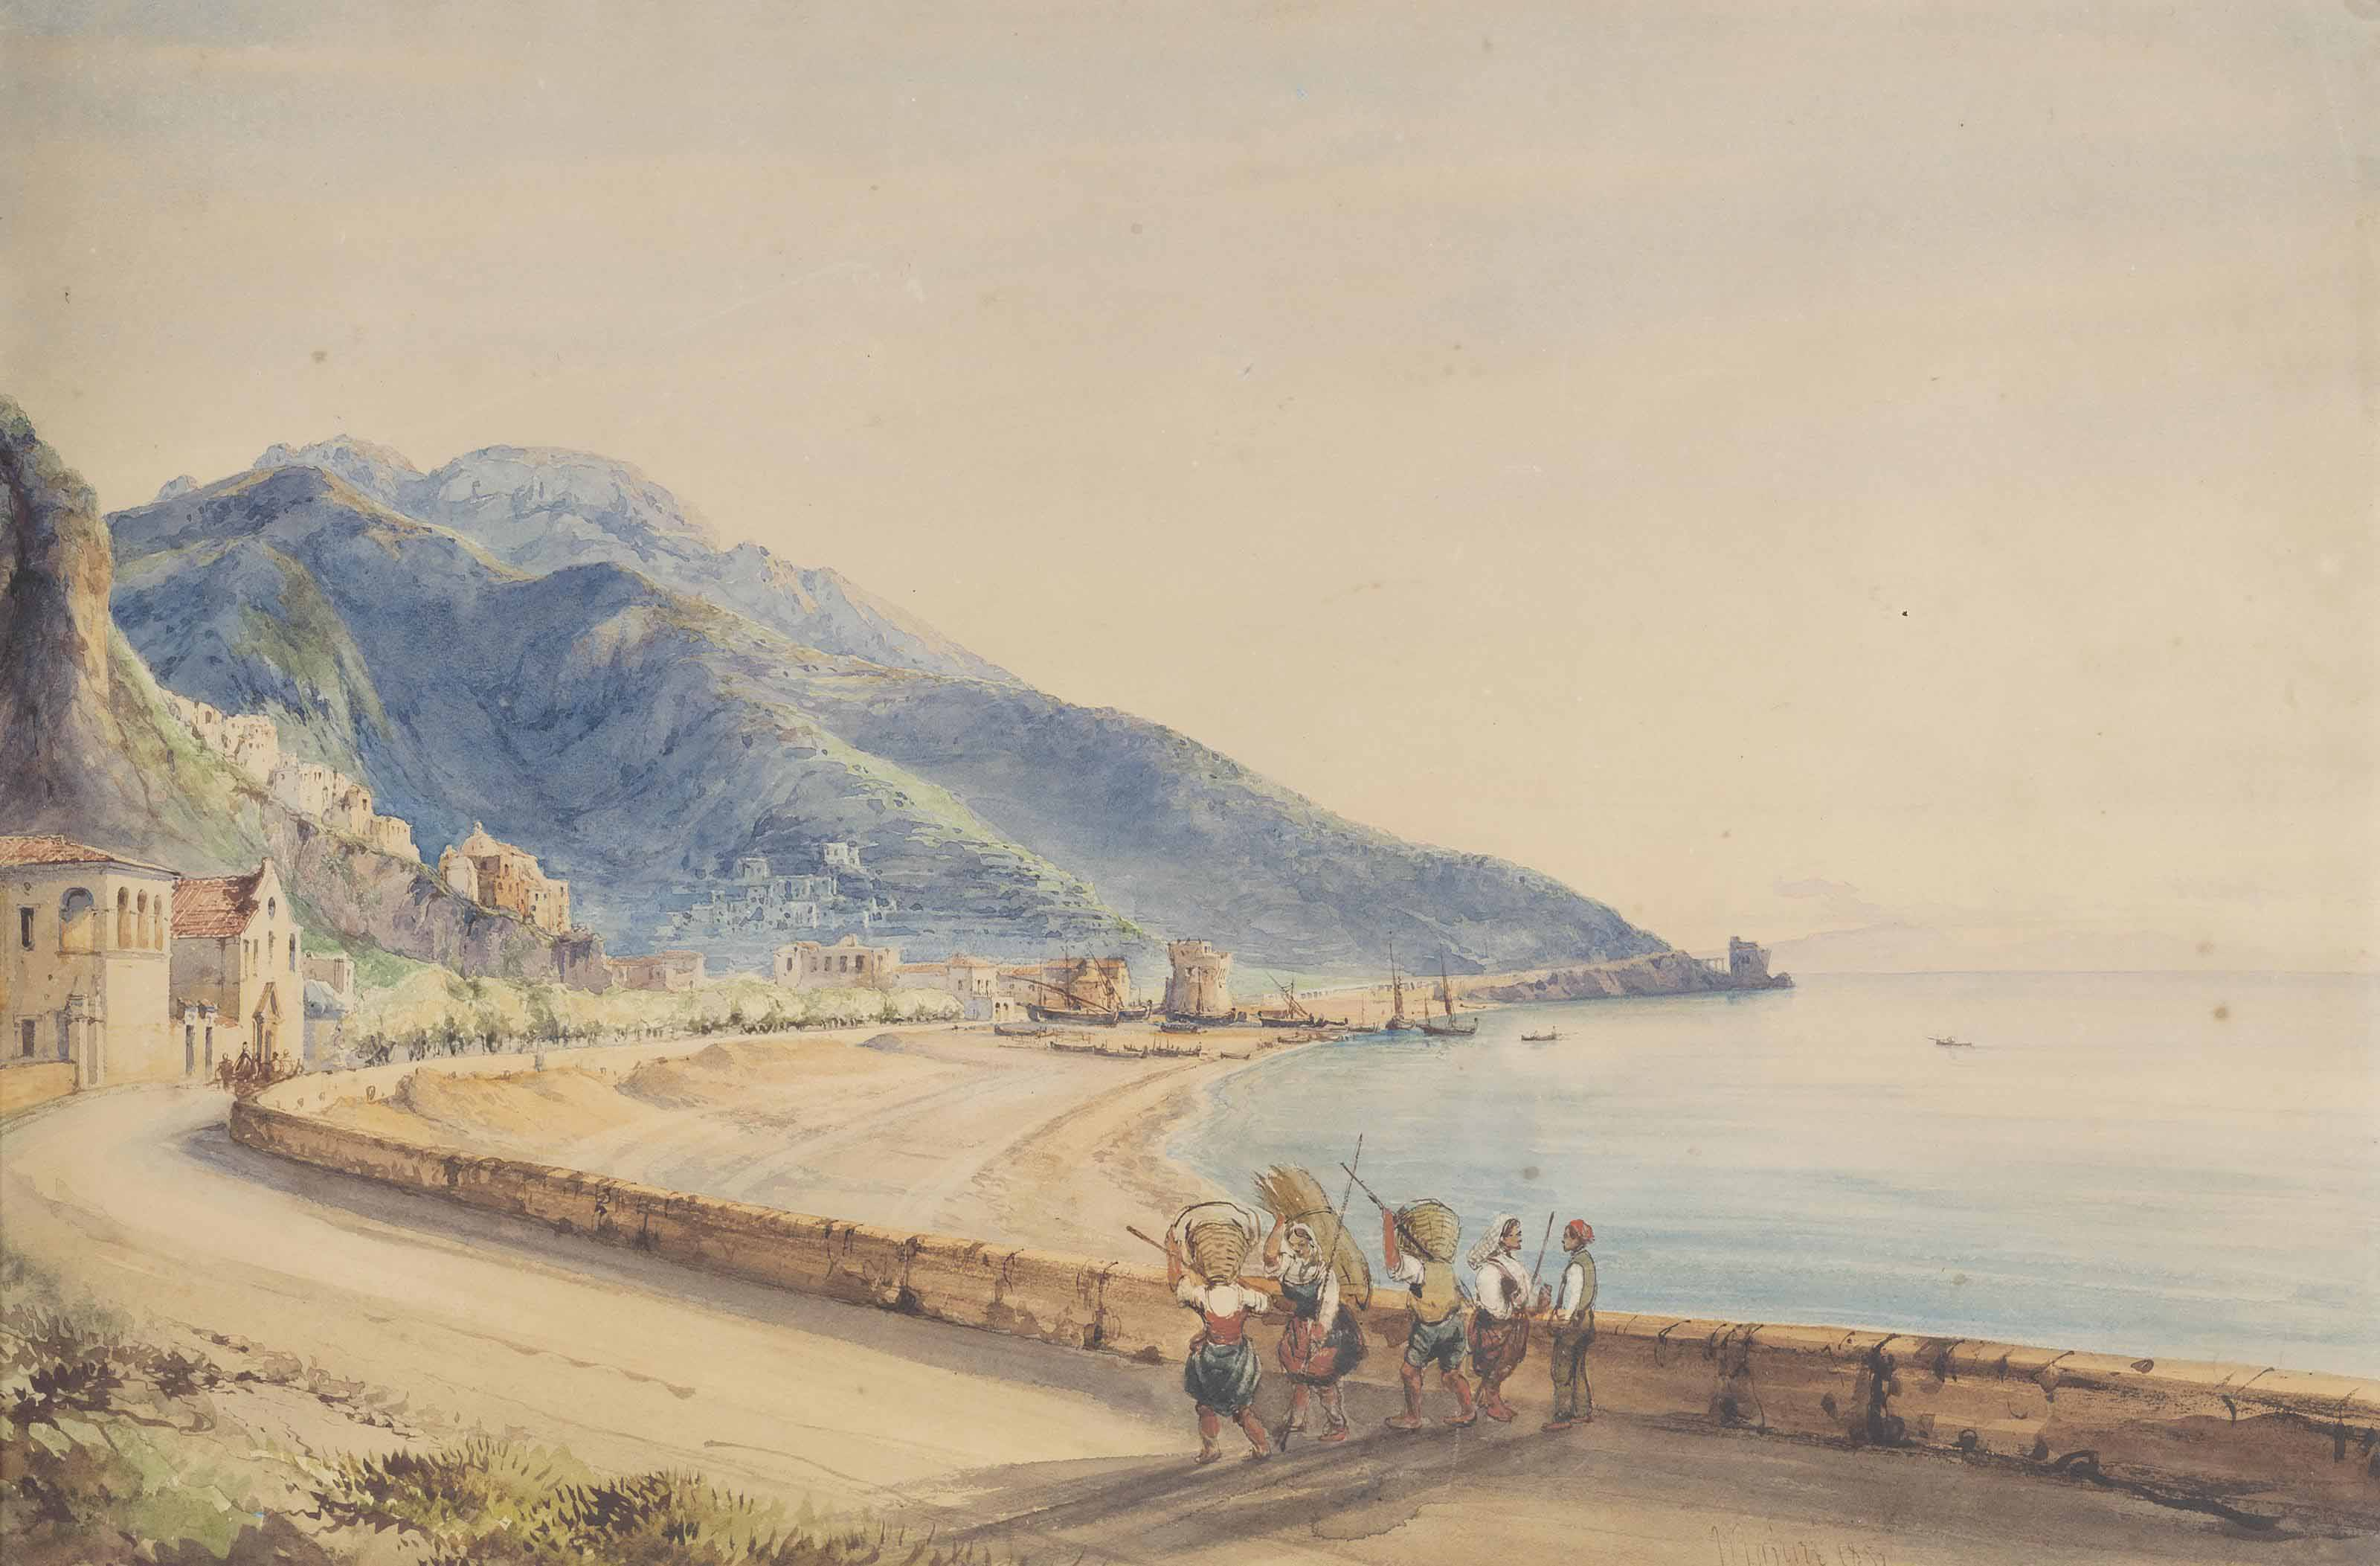 Peasants on a coastal road, Majorca